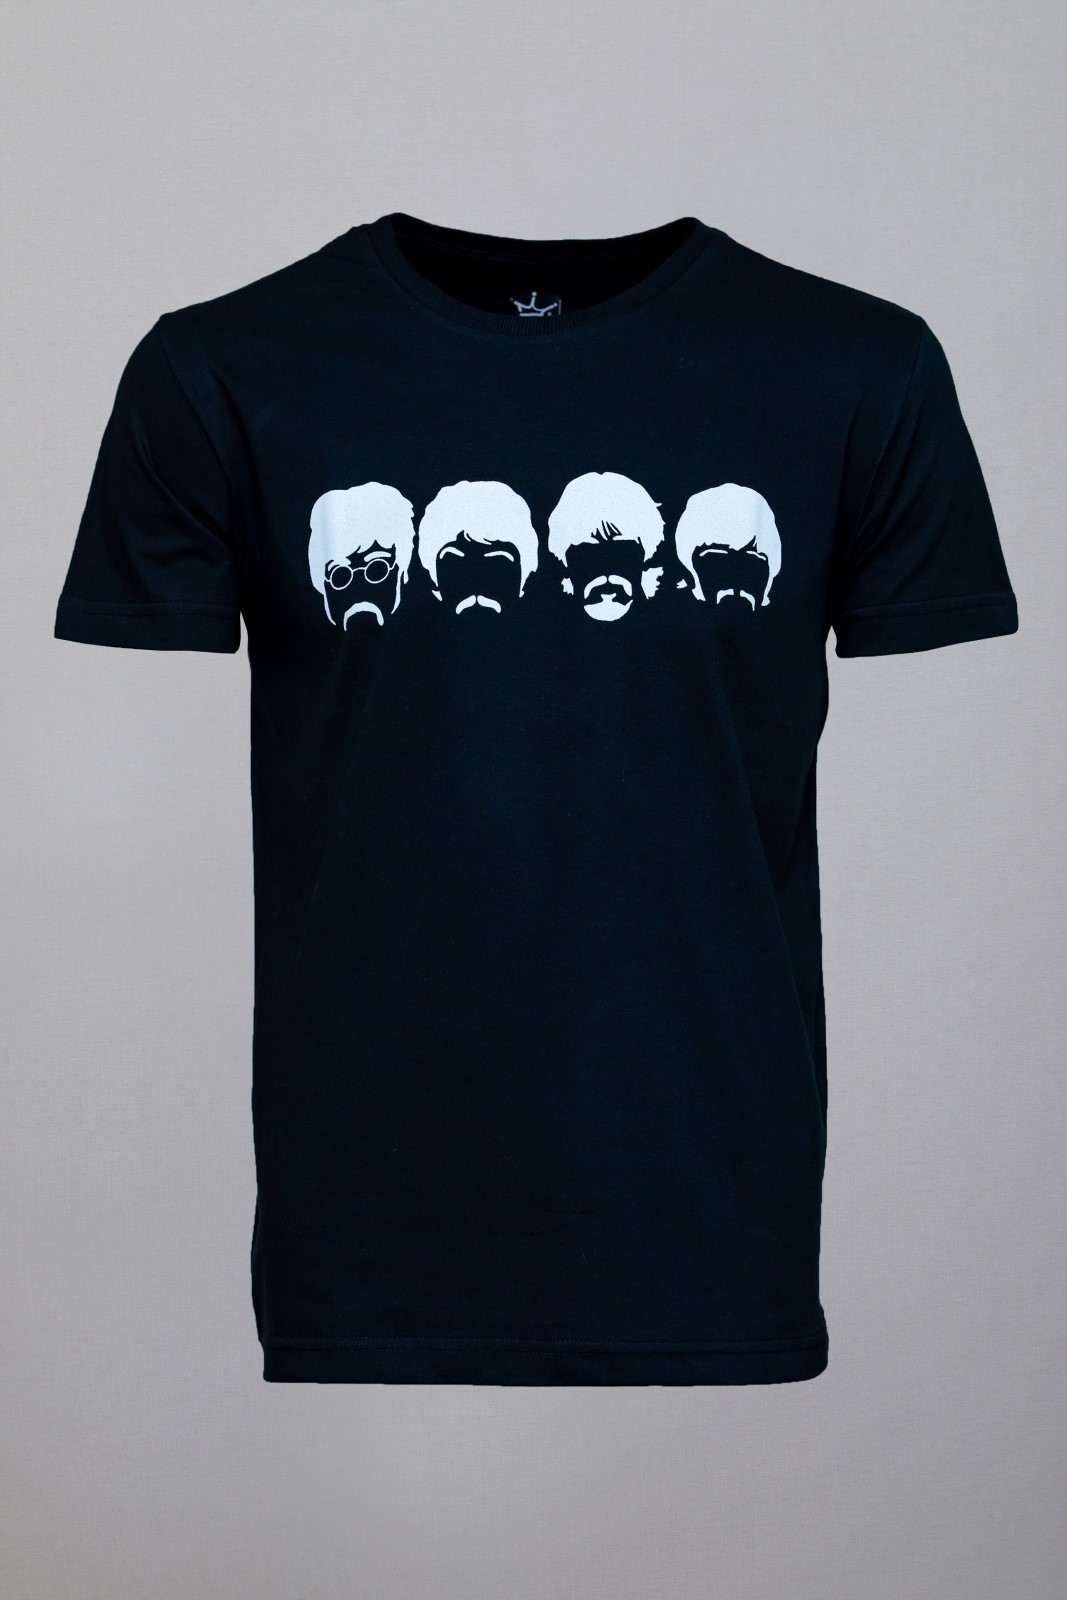 Camiseta CoolWave Liverpool's Four